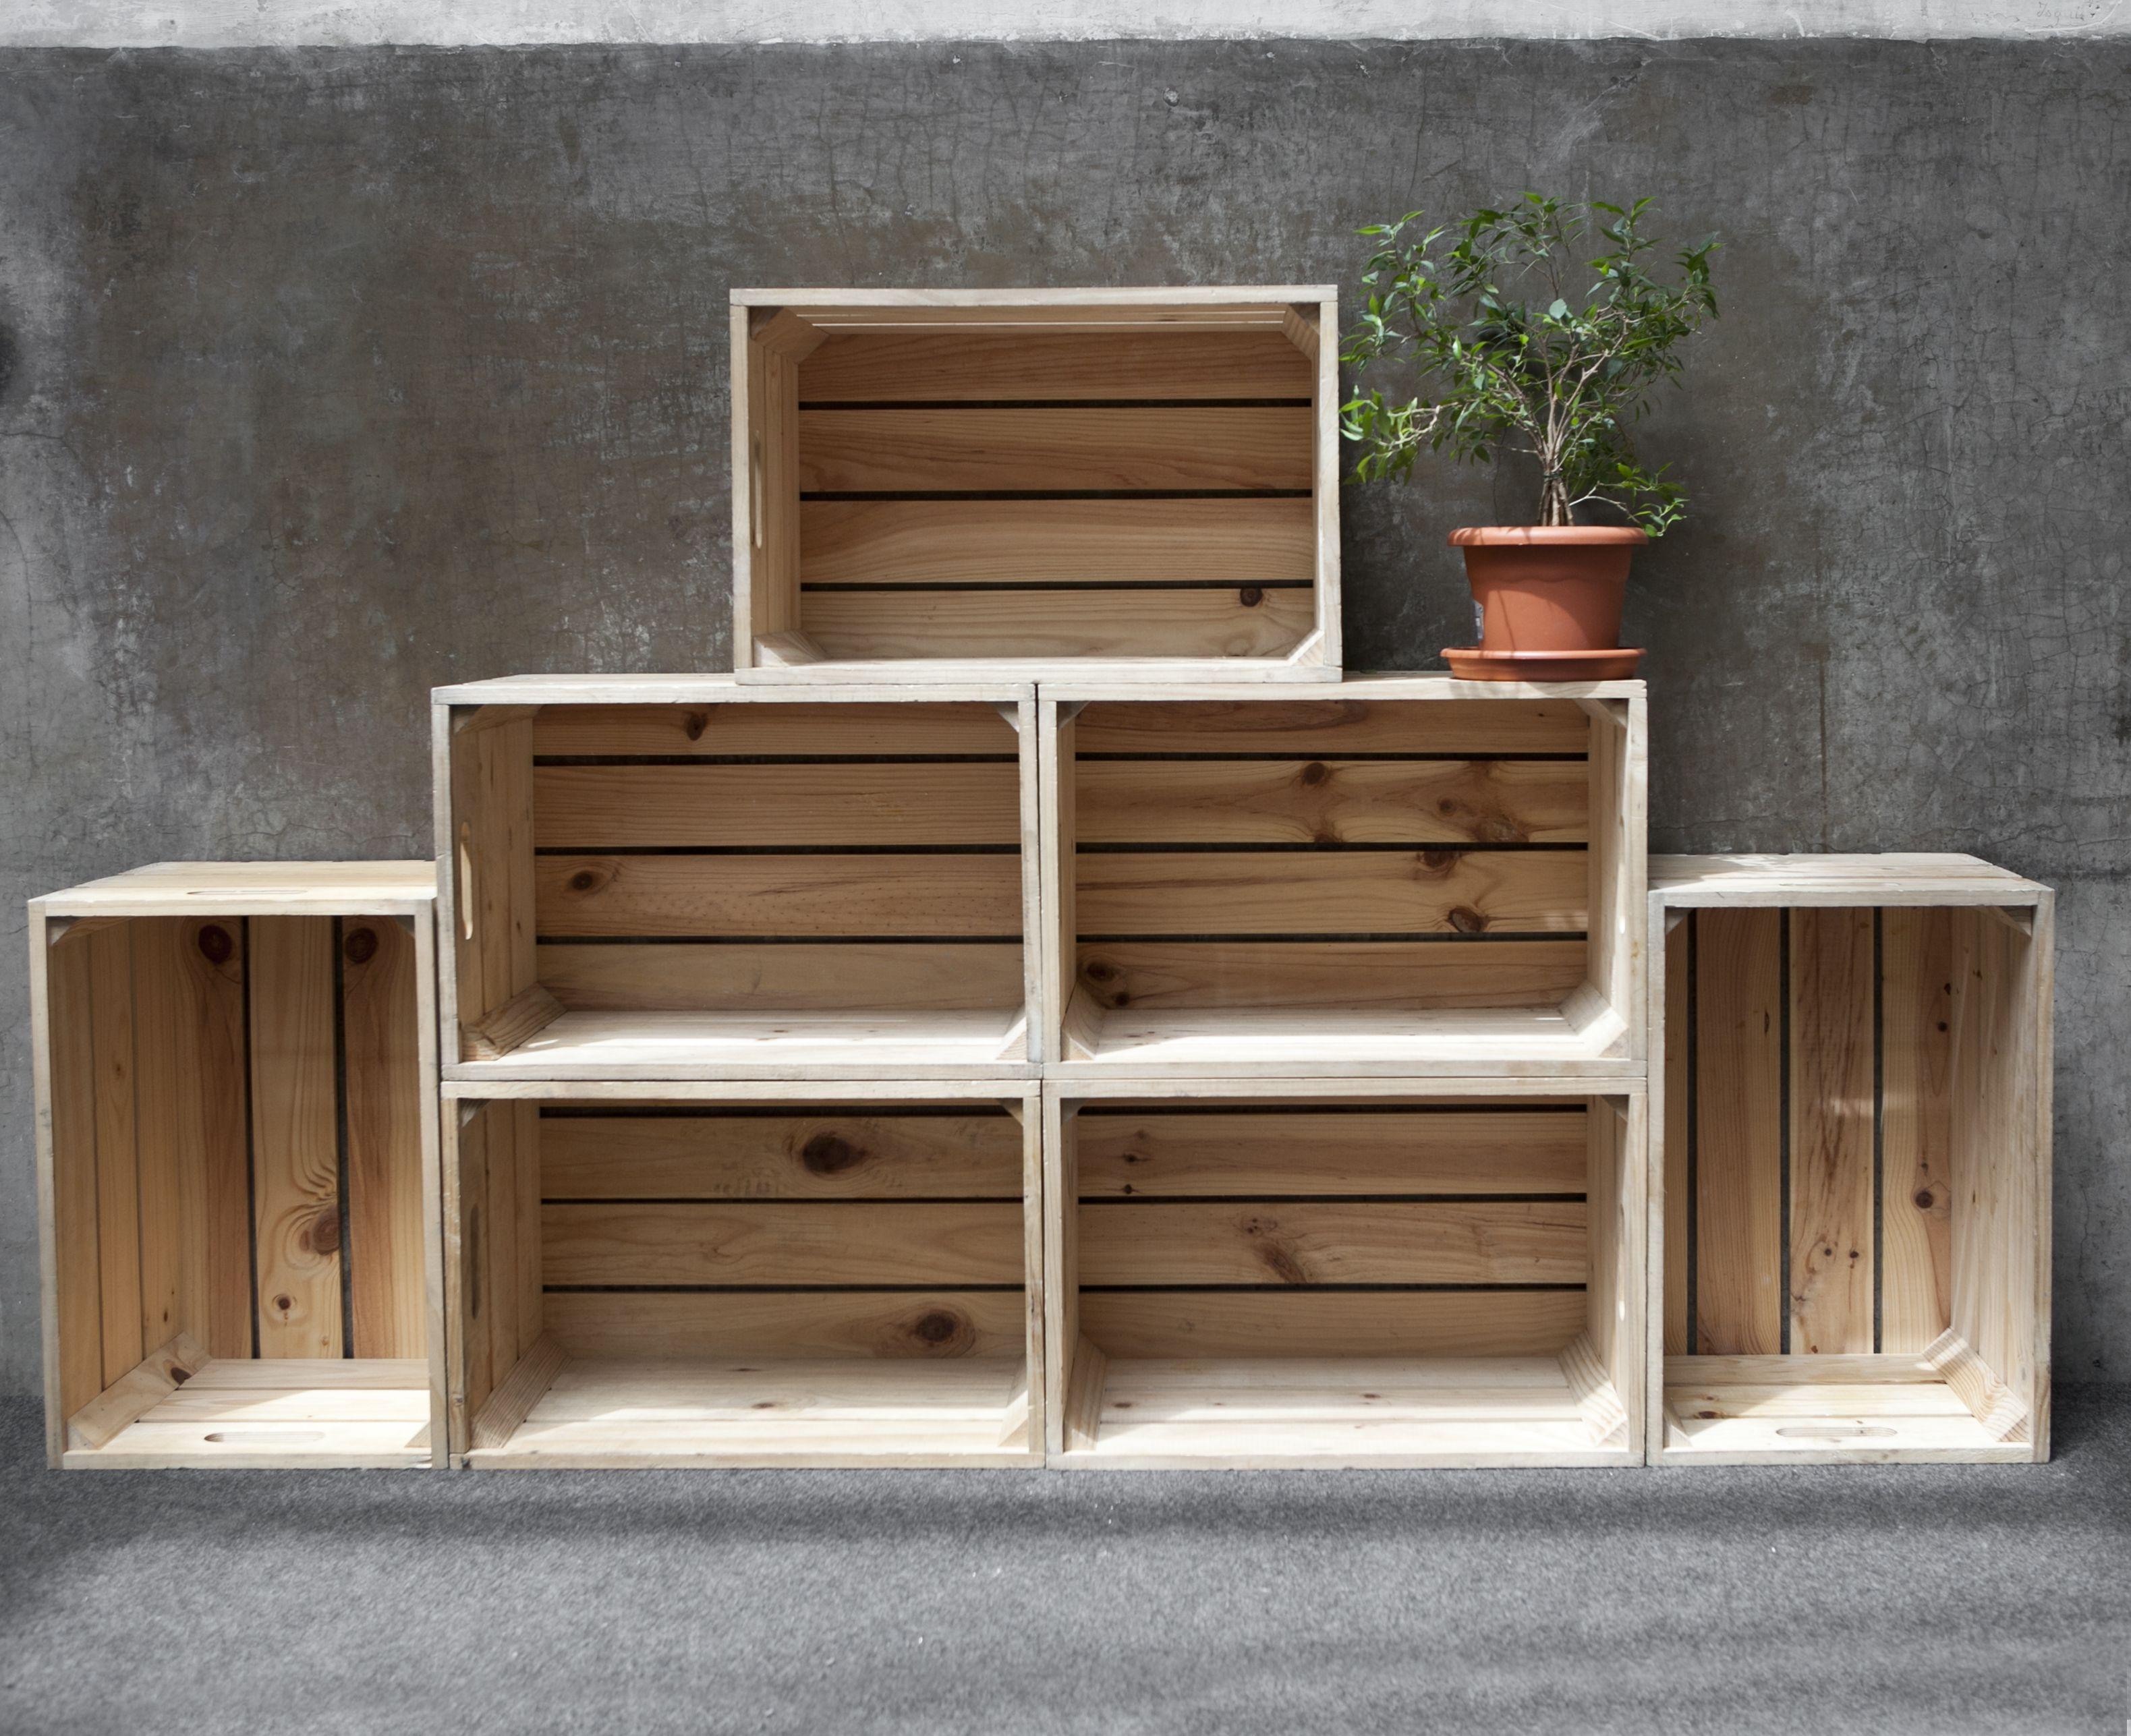 Cajas de madera clara en 2018 home sweet home - Sweet home muebles ...